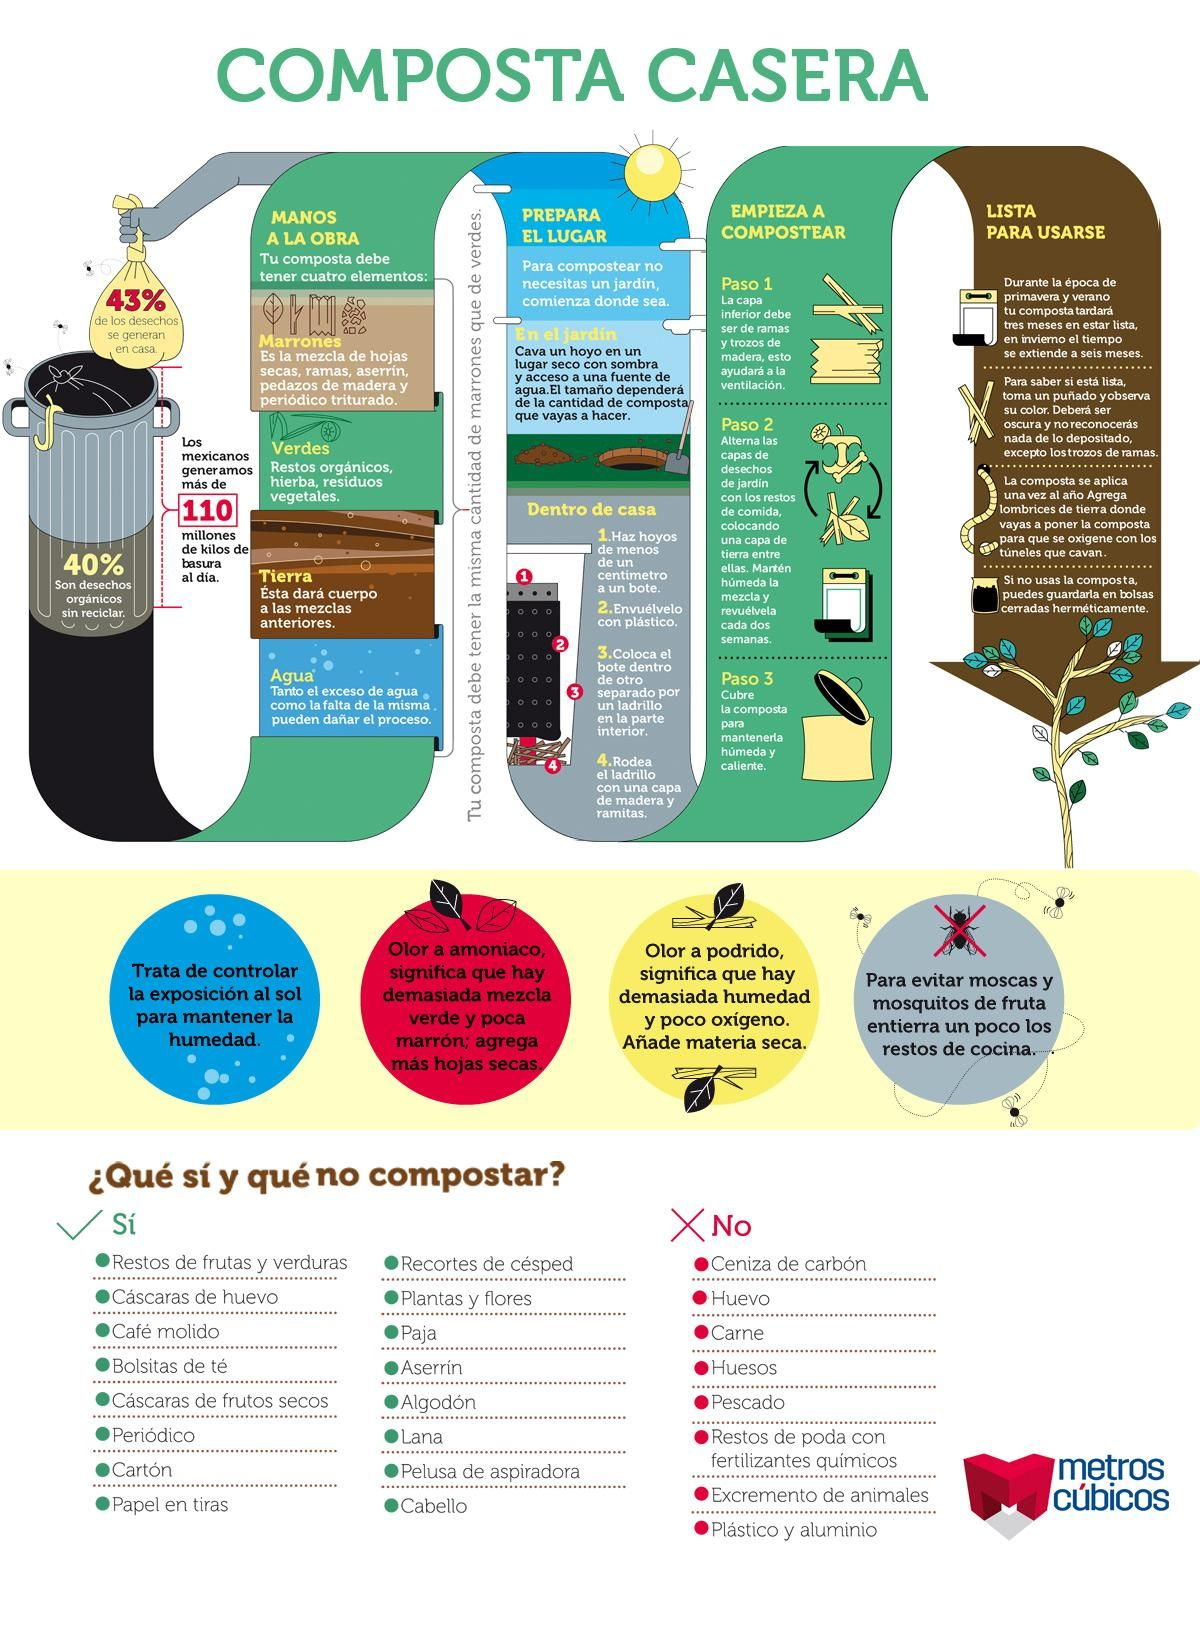 C mo hacer composta en tu casa o depa ideas de jardiner a pinterest composting gardens - Como hacer compost en casa ...